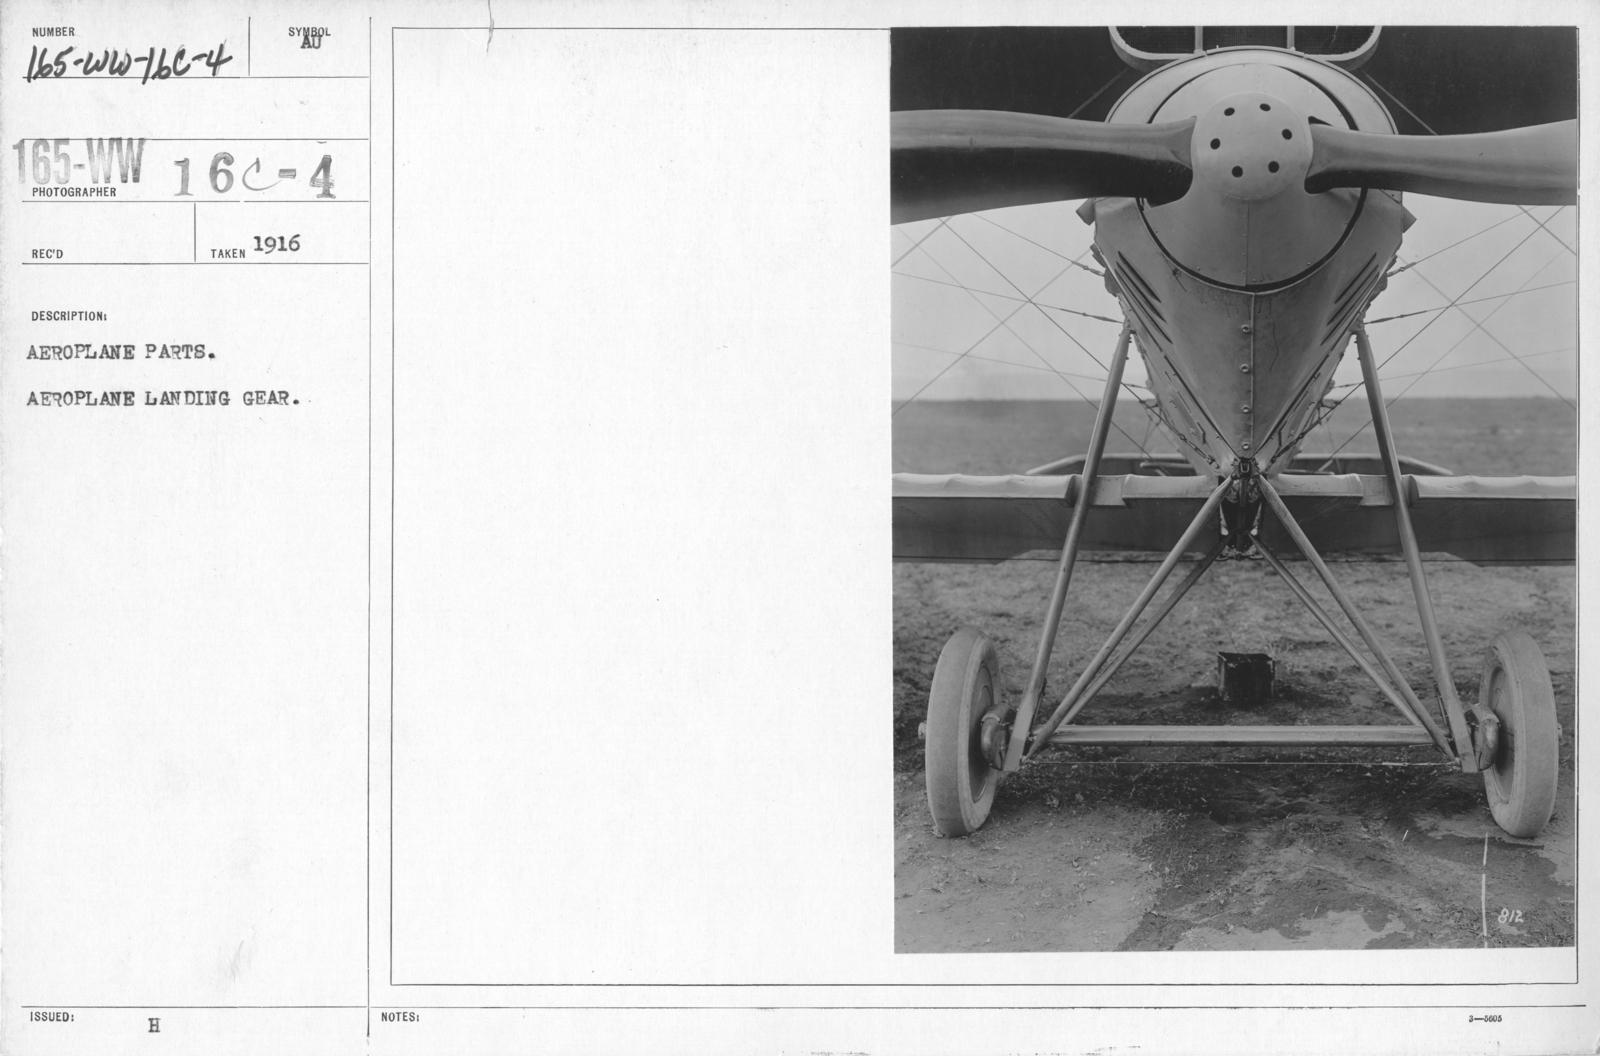 Airplanes - Parts - Aeroplane parts  Aeroplane landing gear